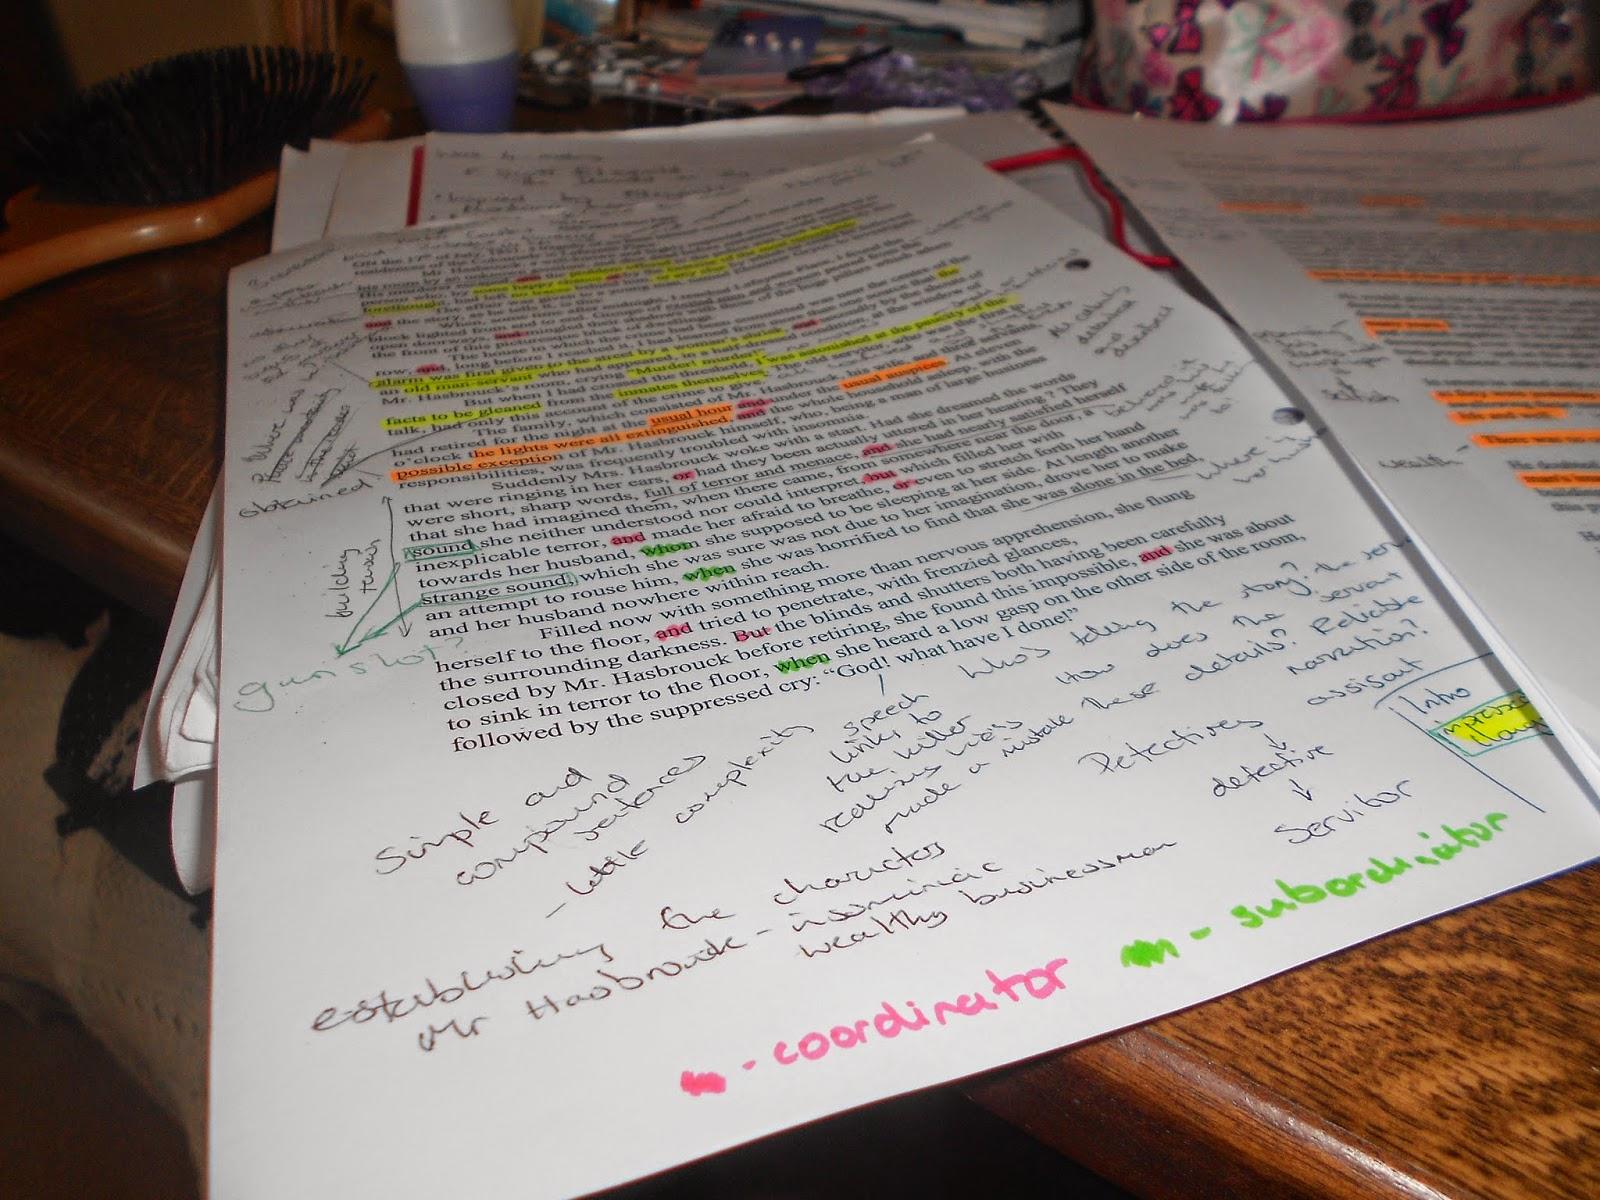 Pedagio na br 101 essay